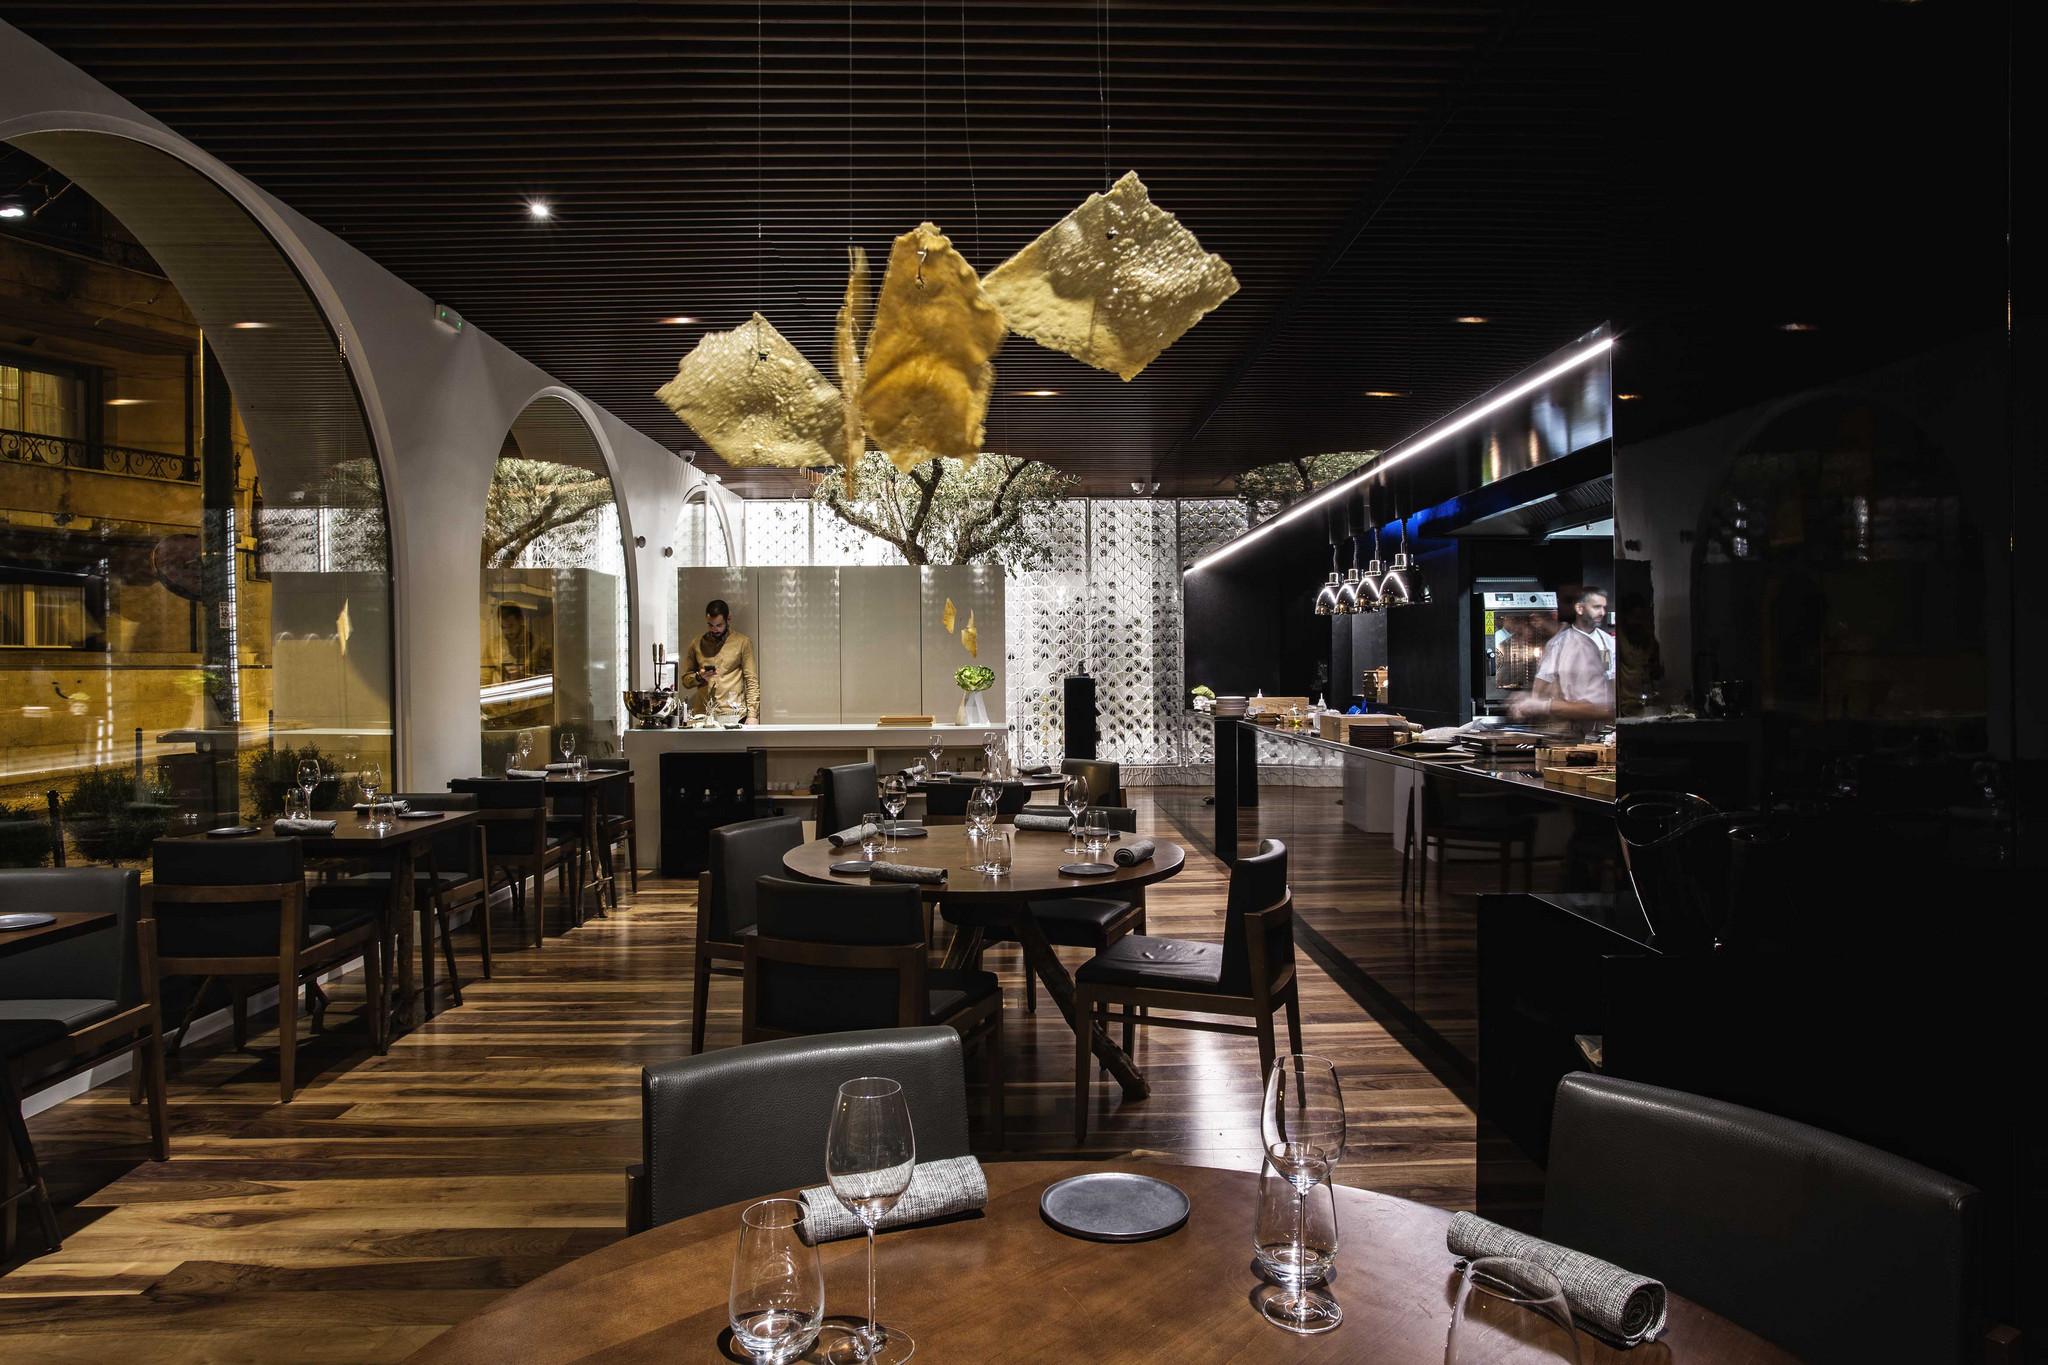 restaurante loco _mg_03794 copy.jpg